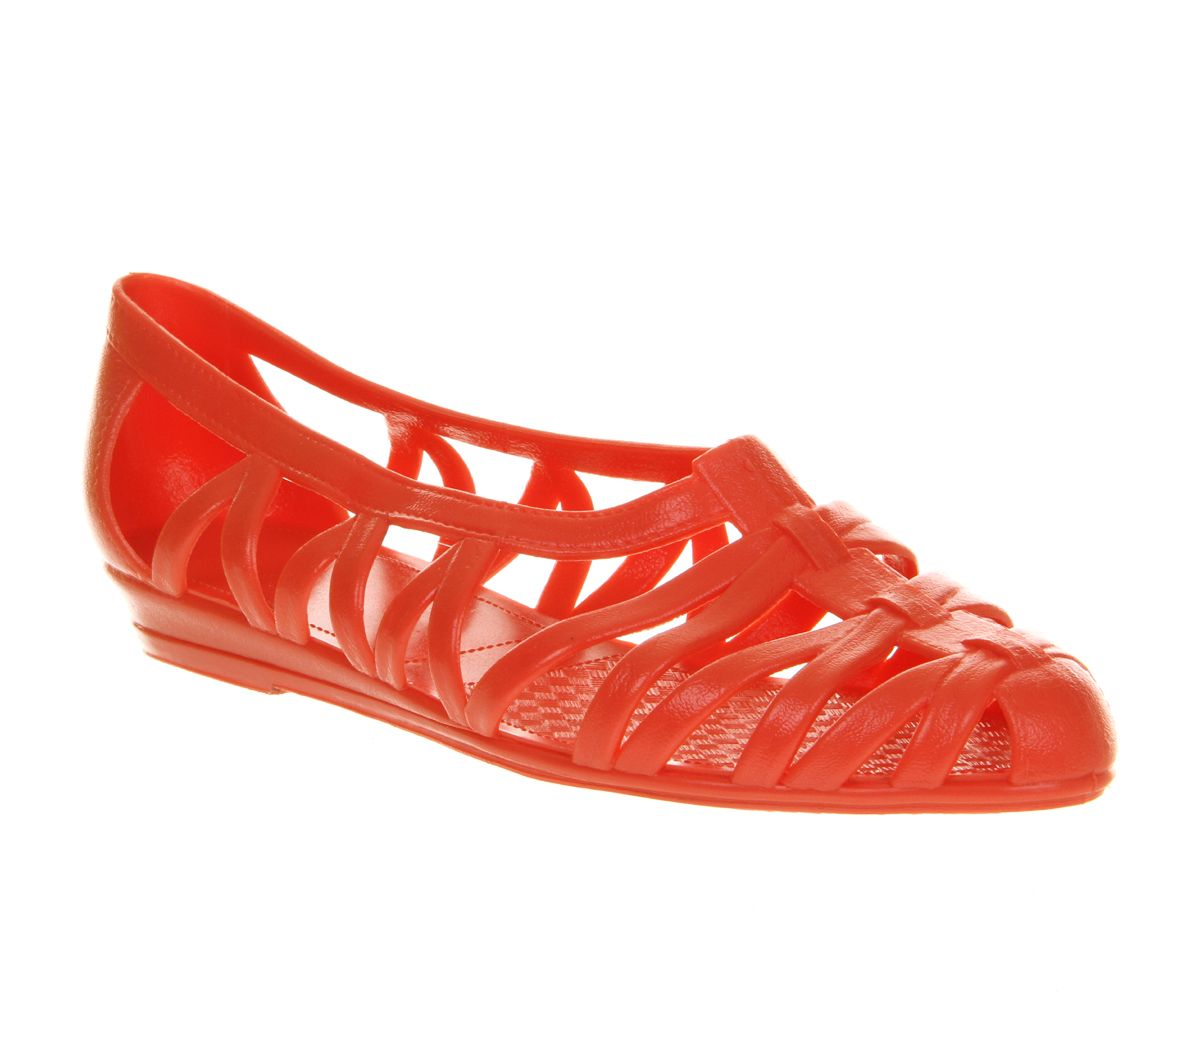 JuJu Vicky Juju Jelly Coral - Sandals